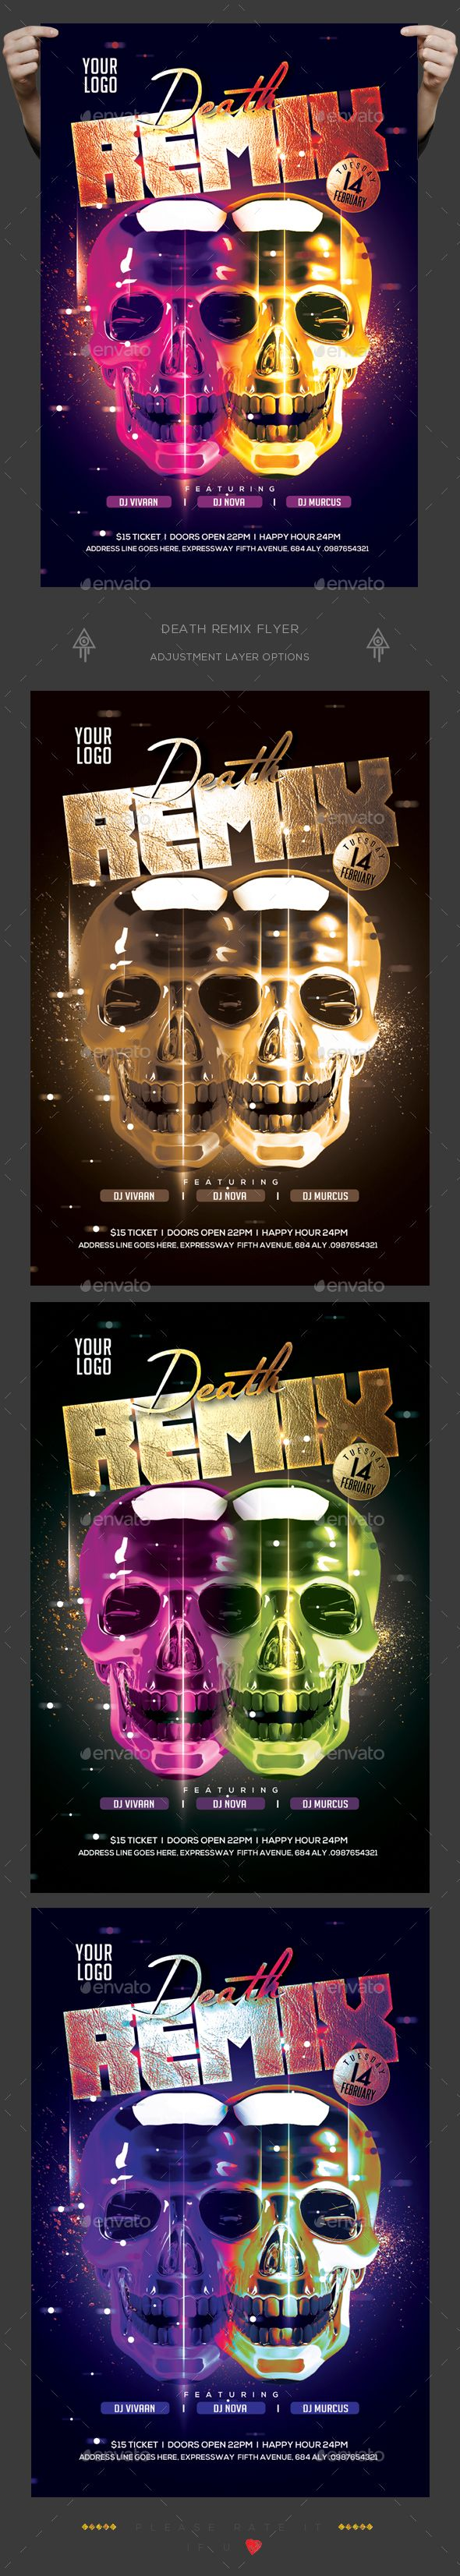 Death Remix Flyer — Photoshop PSD #grunge #festival • Download ➝ https://graphicriver.net/item/death-remix-flyer/19381273?ref=pxcr